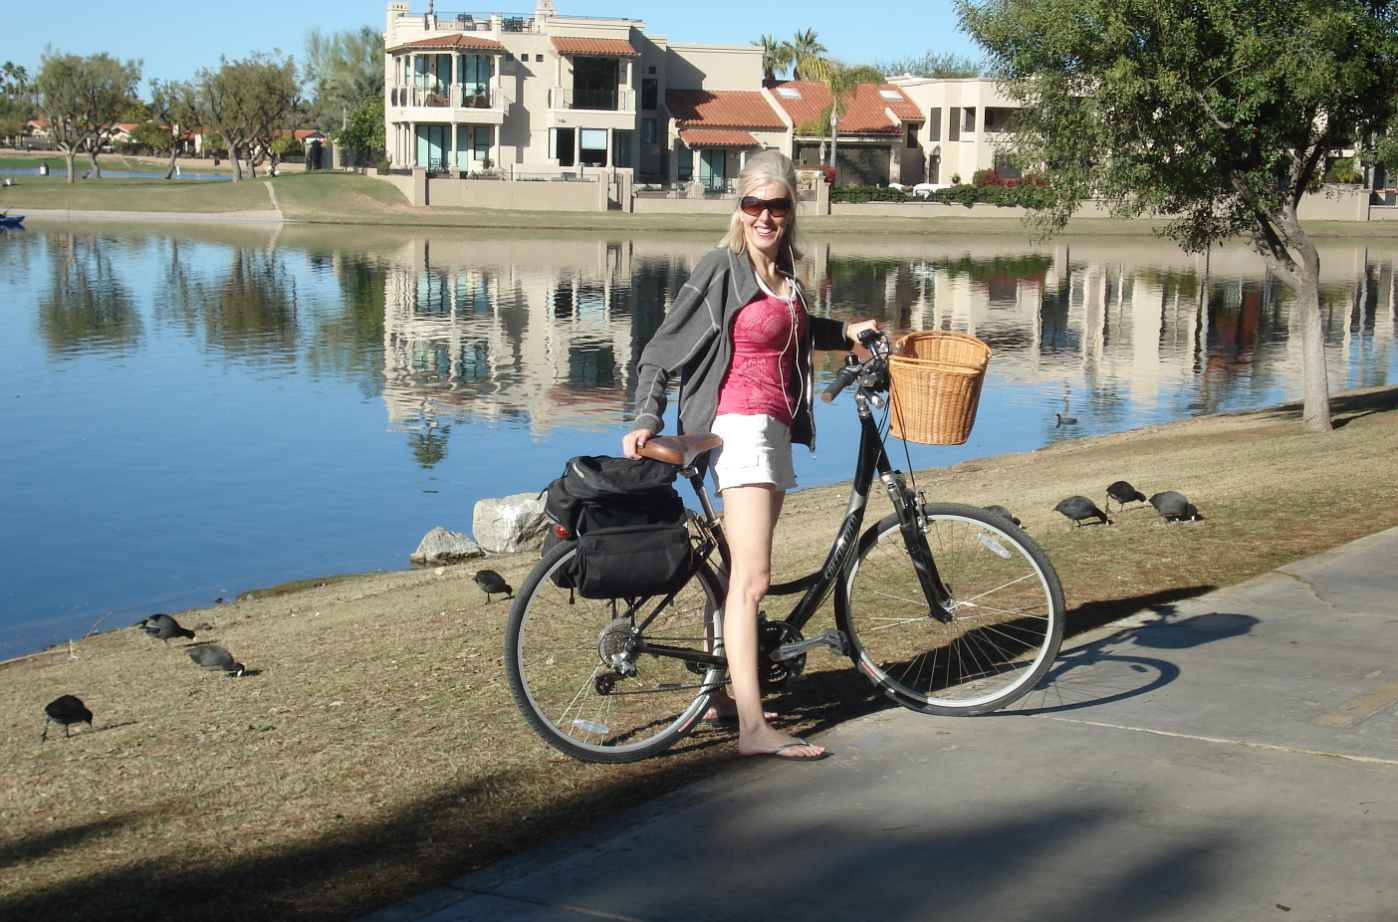 Bikes In Rain At Trader Joes >> Elle Is For Living Elle S Life February